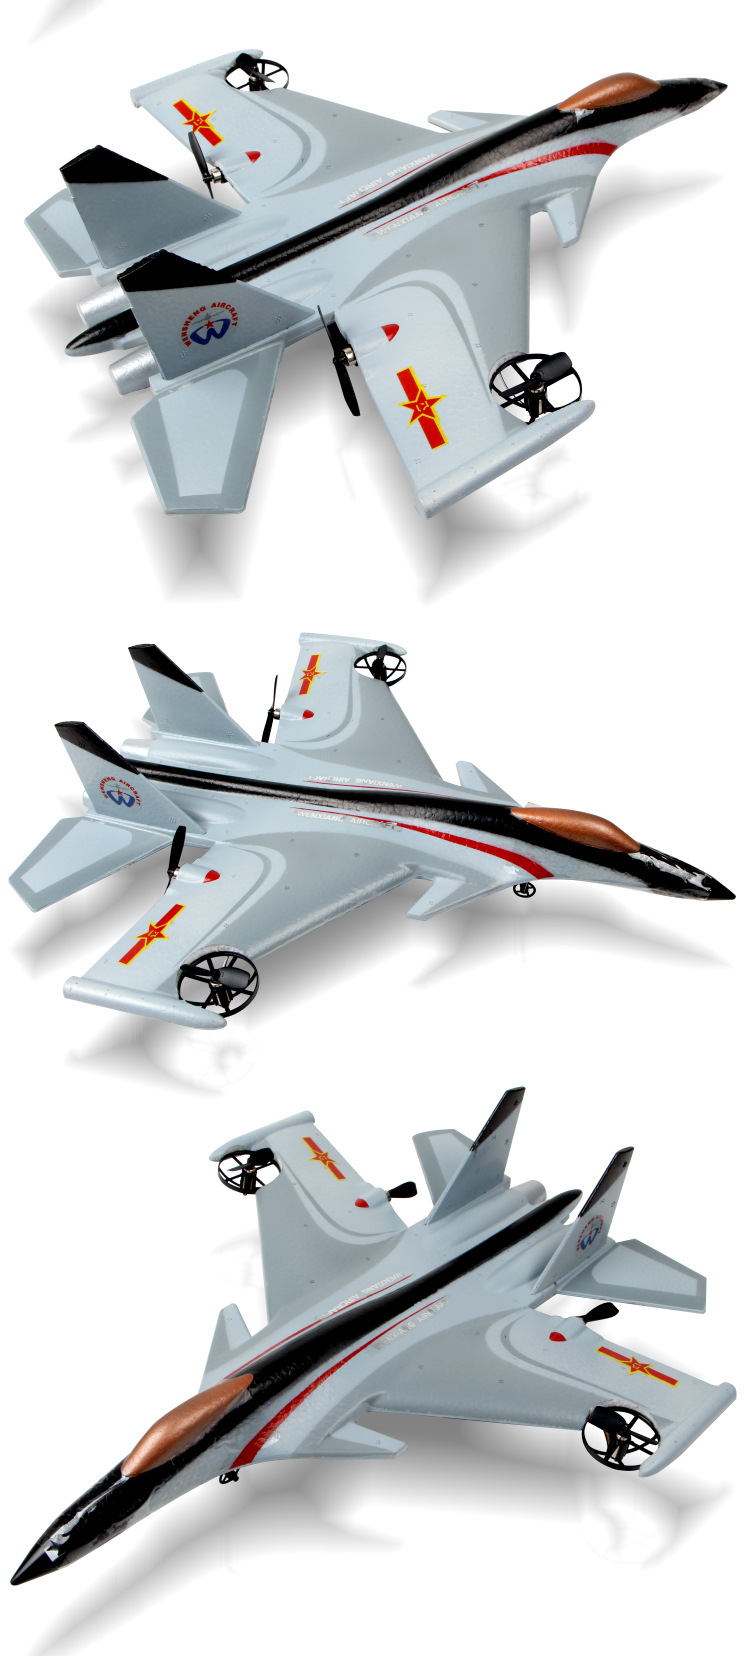 4g遥控滑翔飞机耐摔固定翼泡沫j15玩具